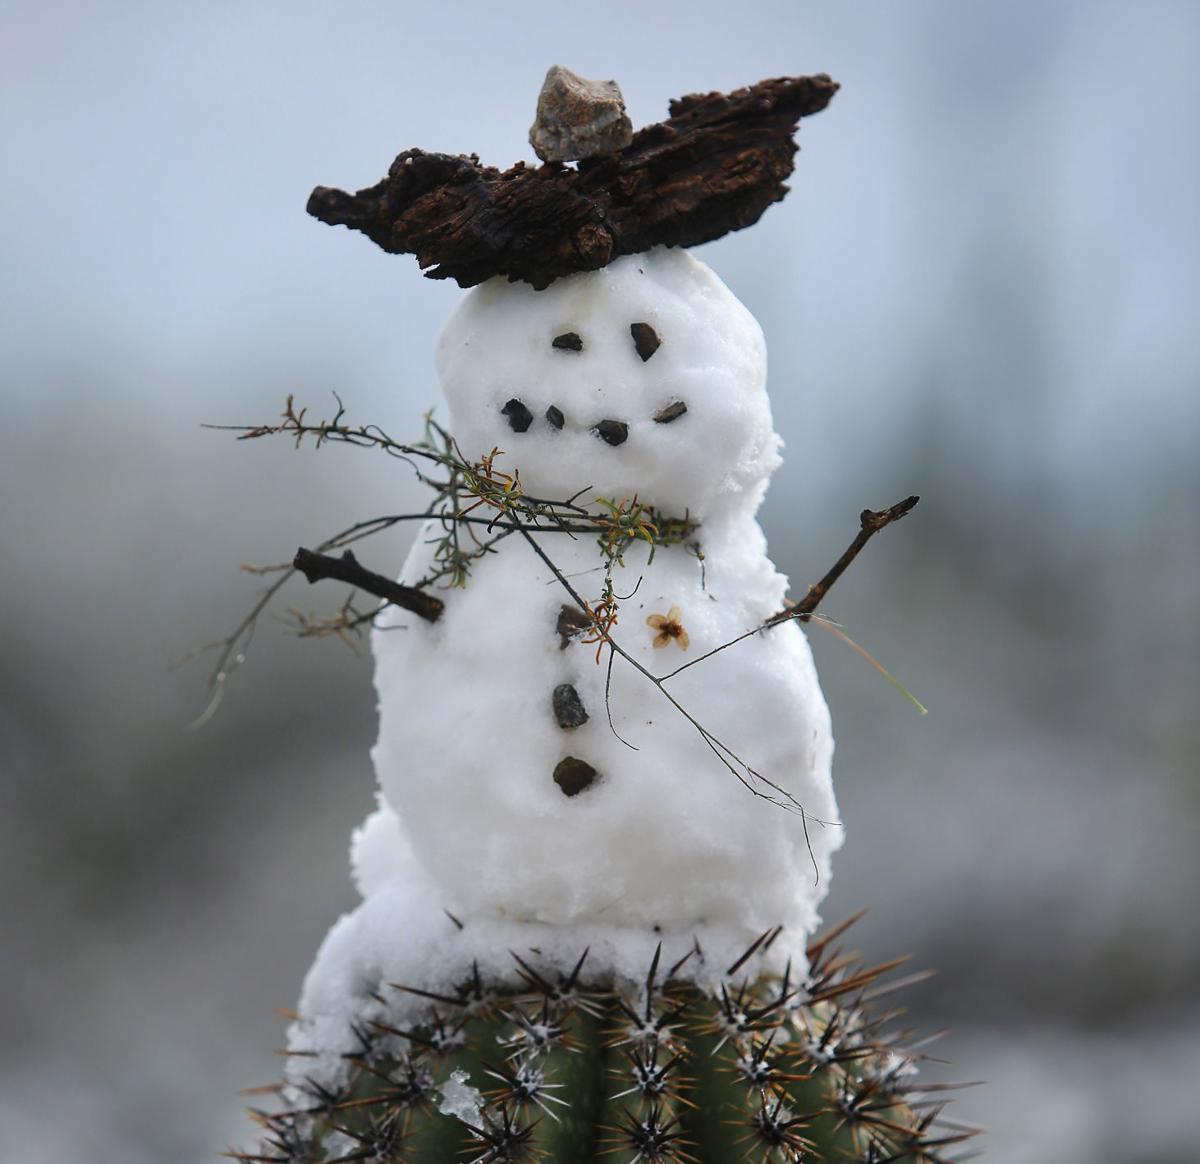 Snow in Southern Arizona